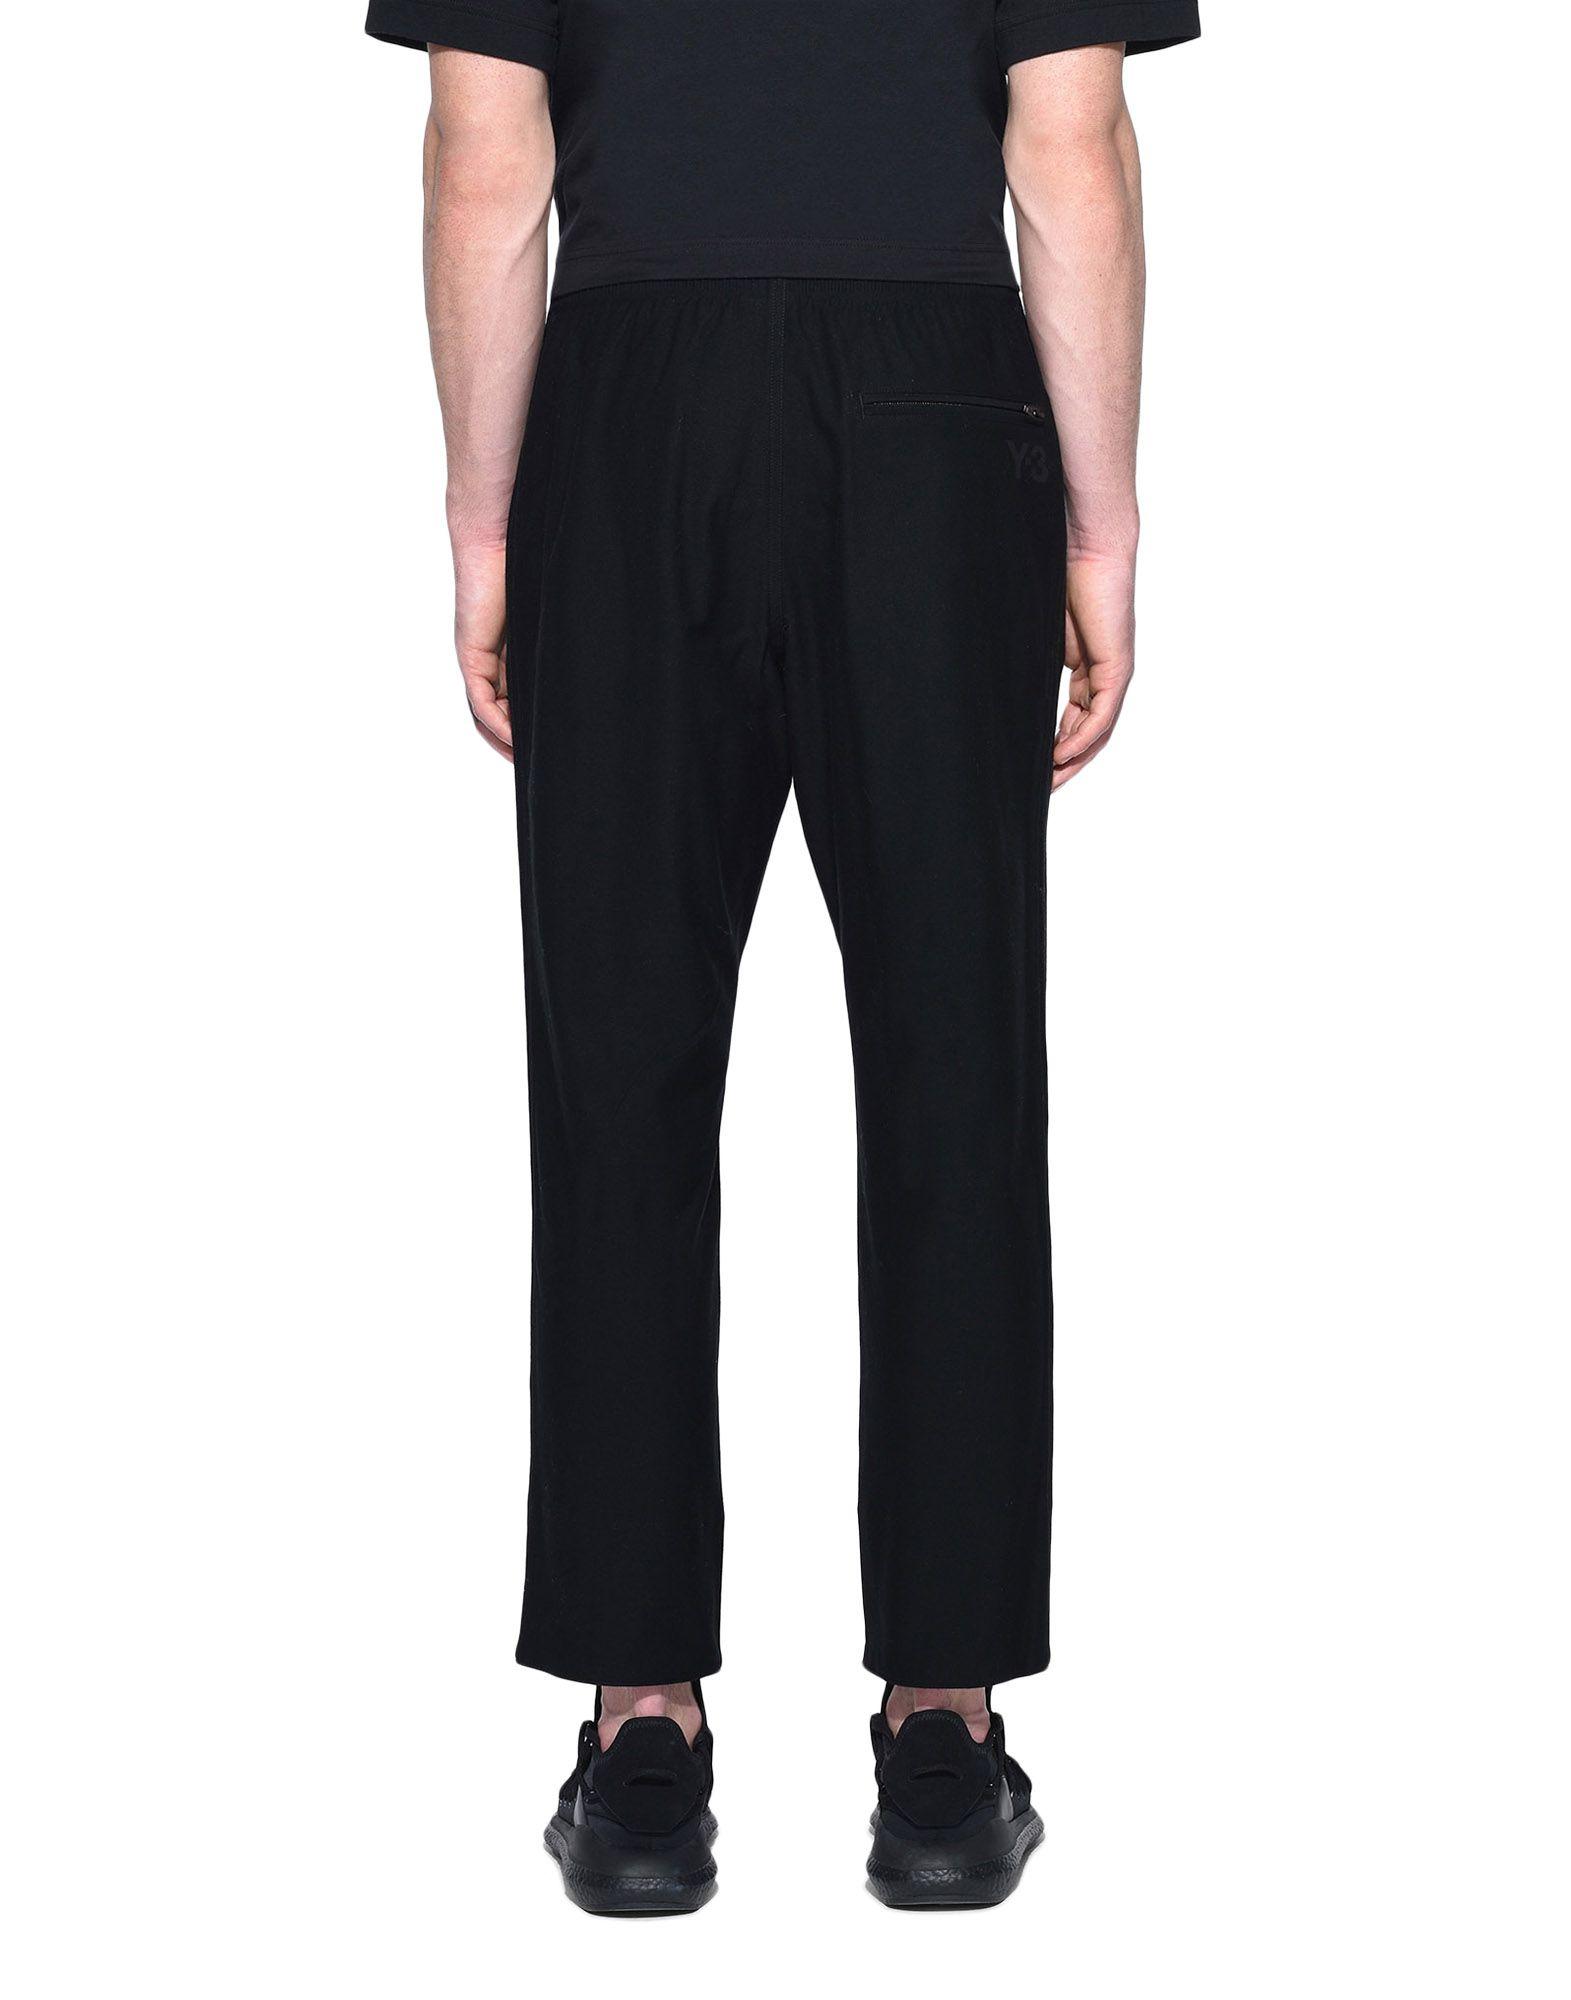 Y-3 Y-3 Twill Cropped Pants Hose Herren d